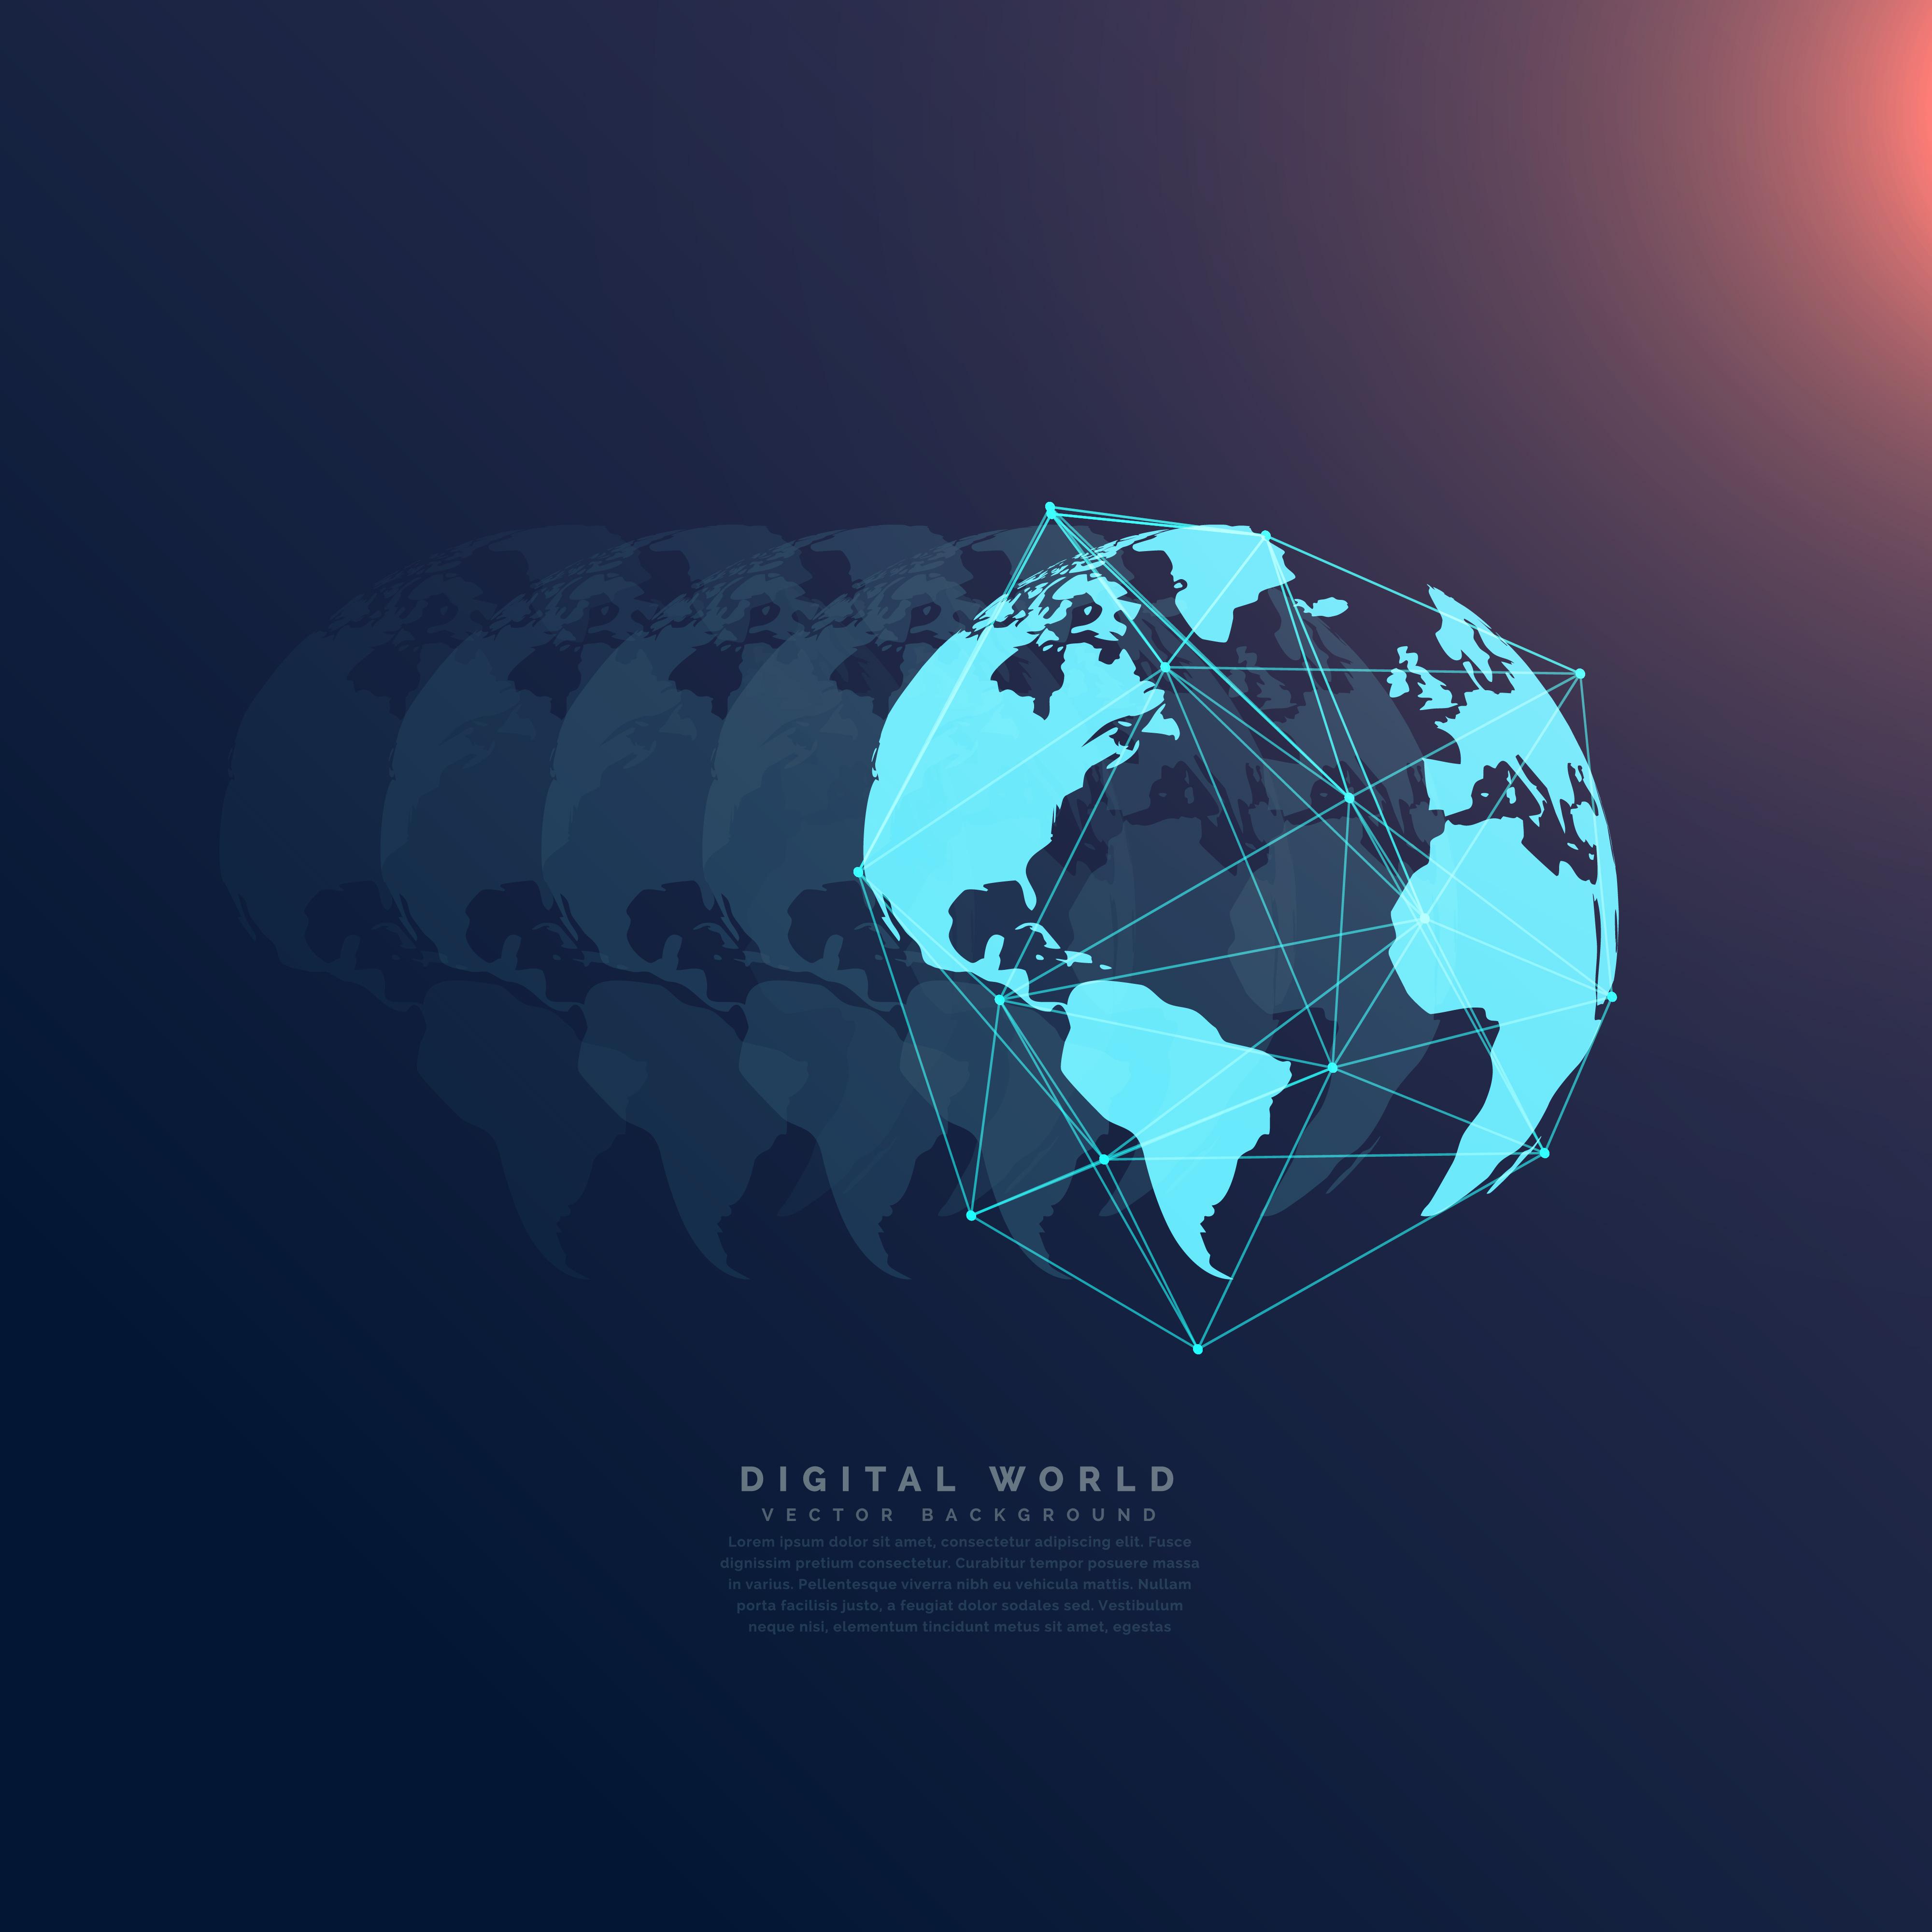 world network communication digital technology concept